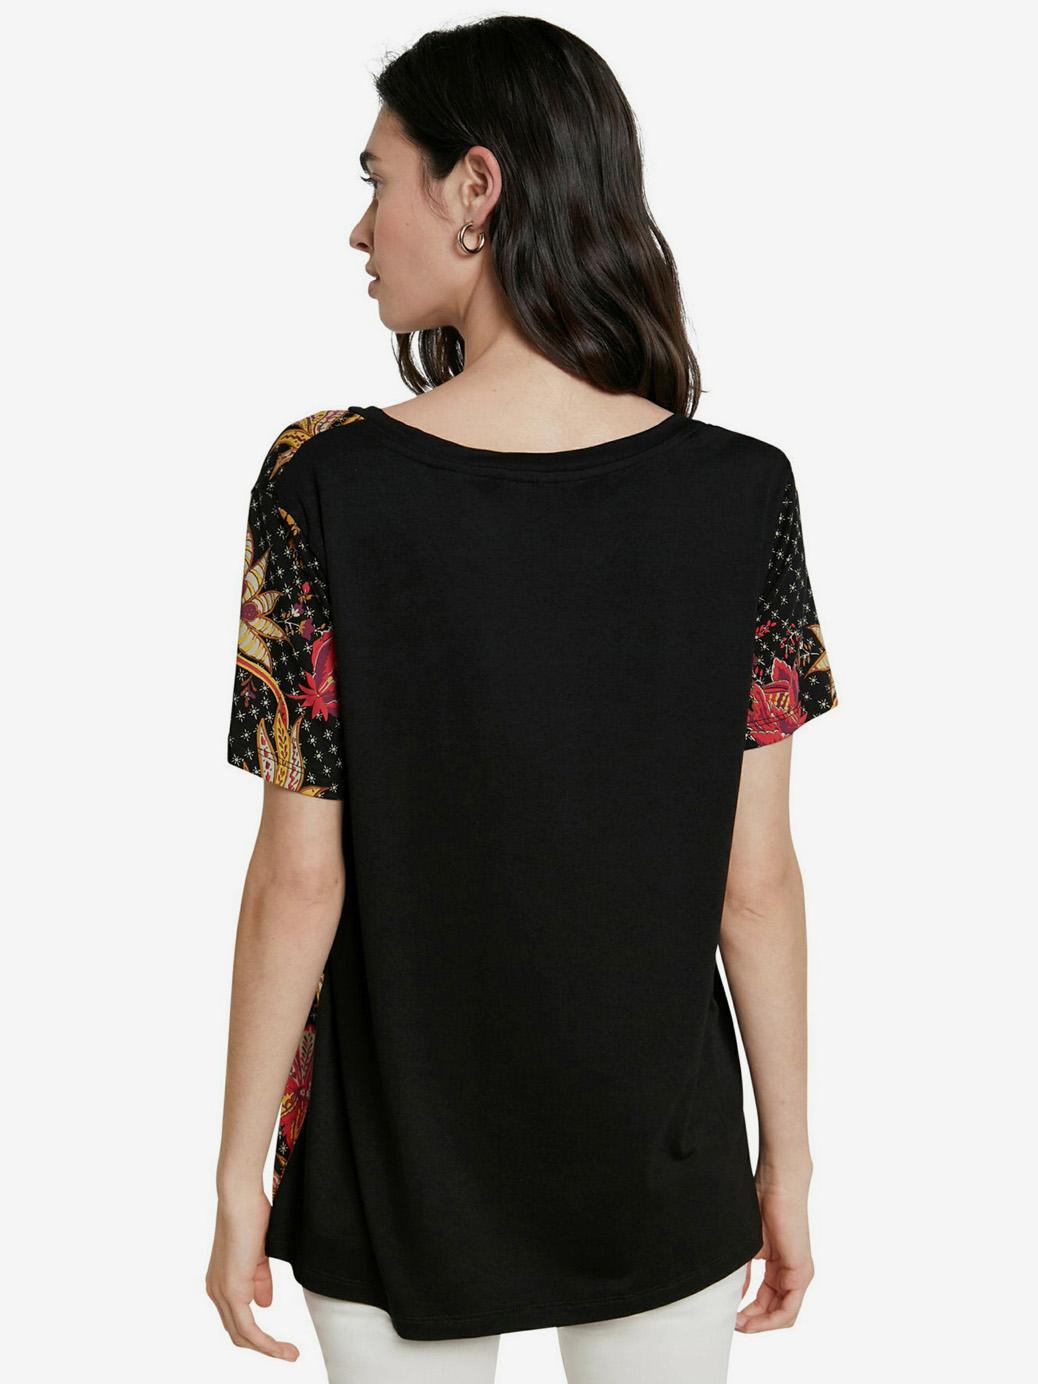 Desigual crna majica TS Praga